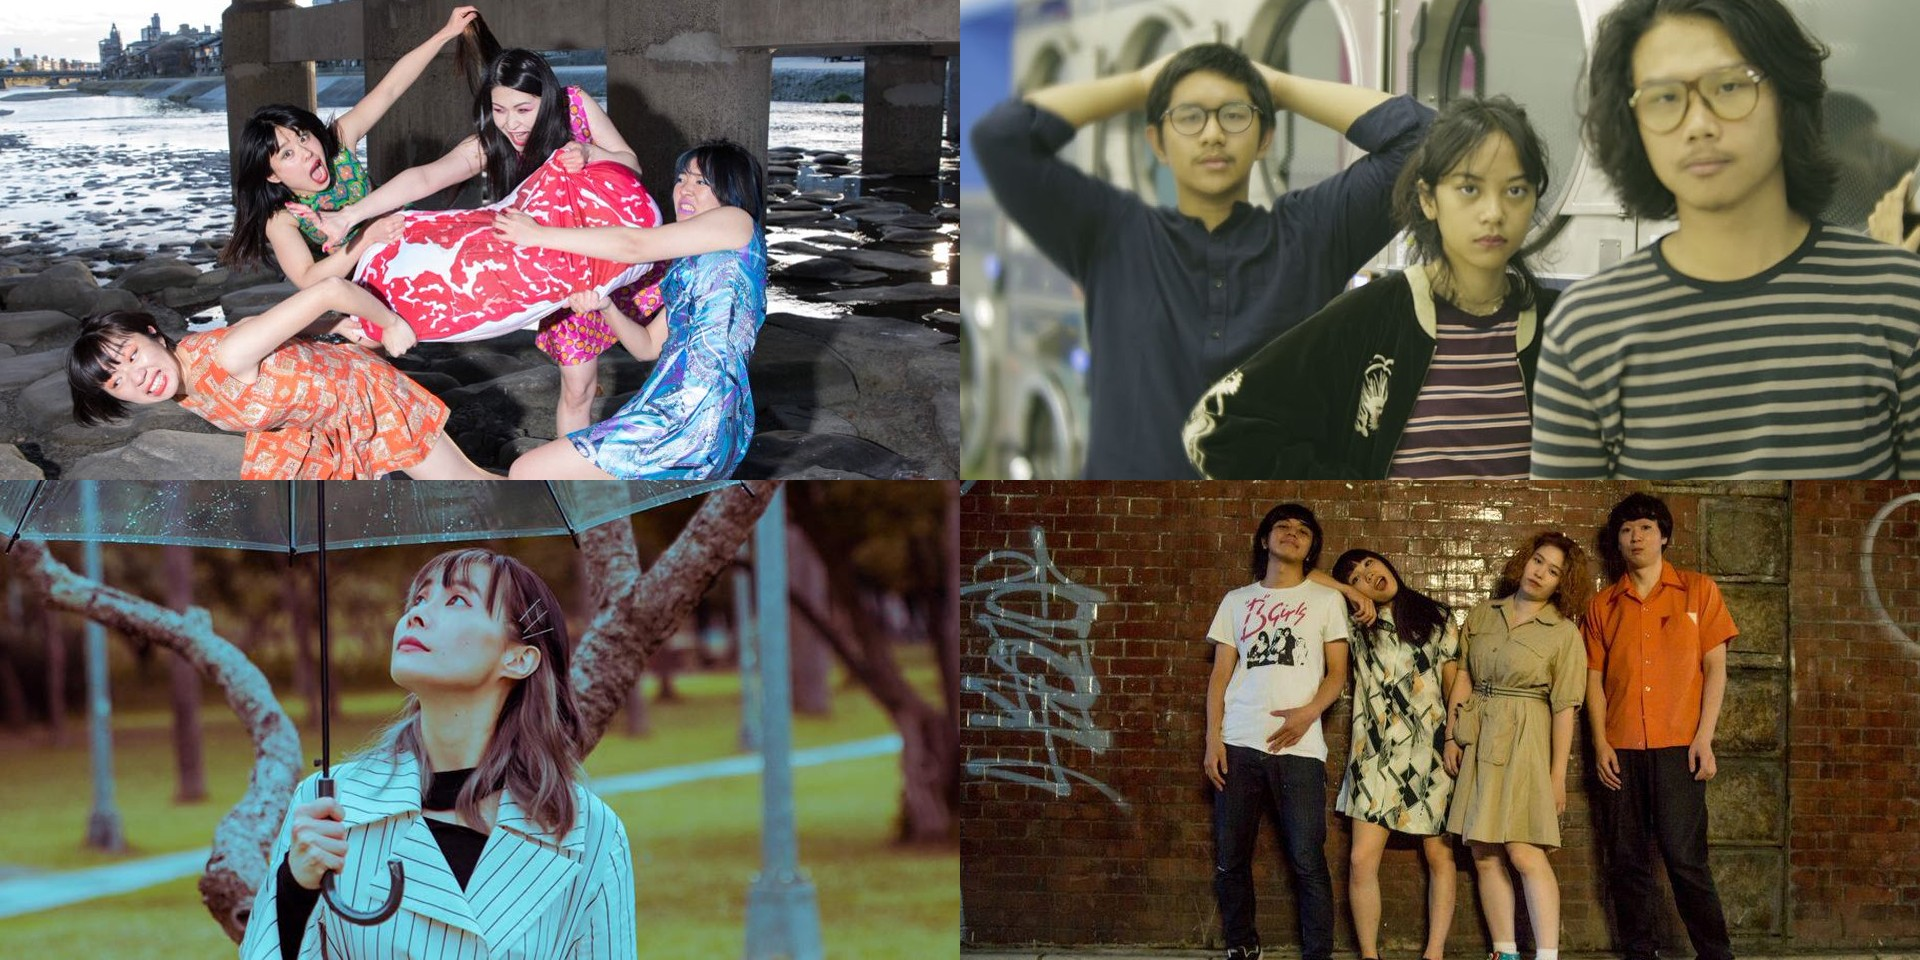 Grrrl Gang, Otoboke Beaver, Enno Cheng, Hazy Sour Cherry, and more to perform at SXSW Online 2021